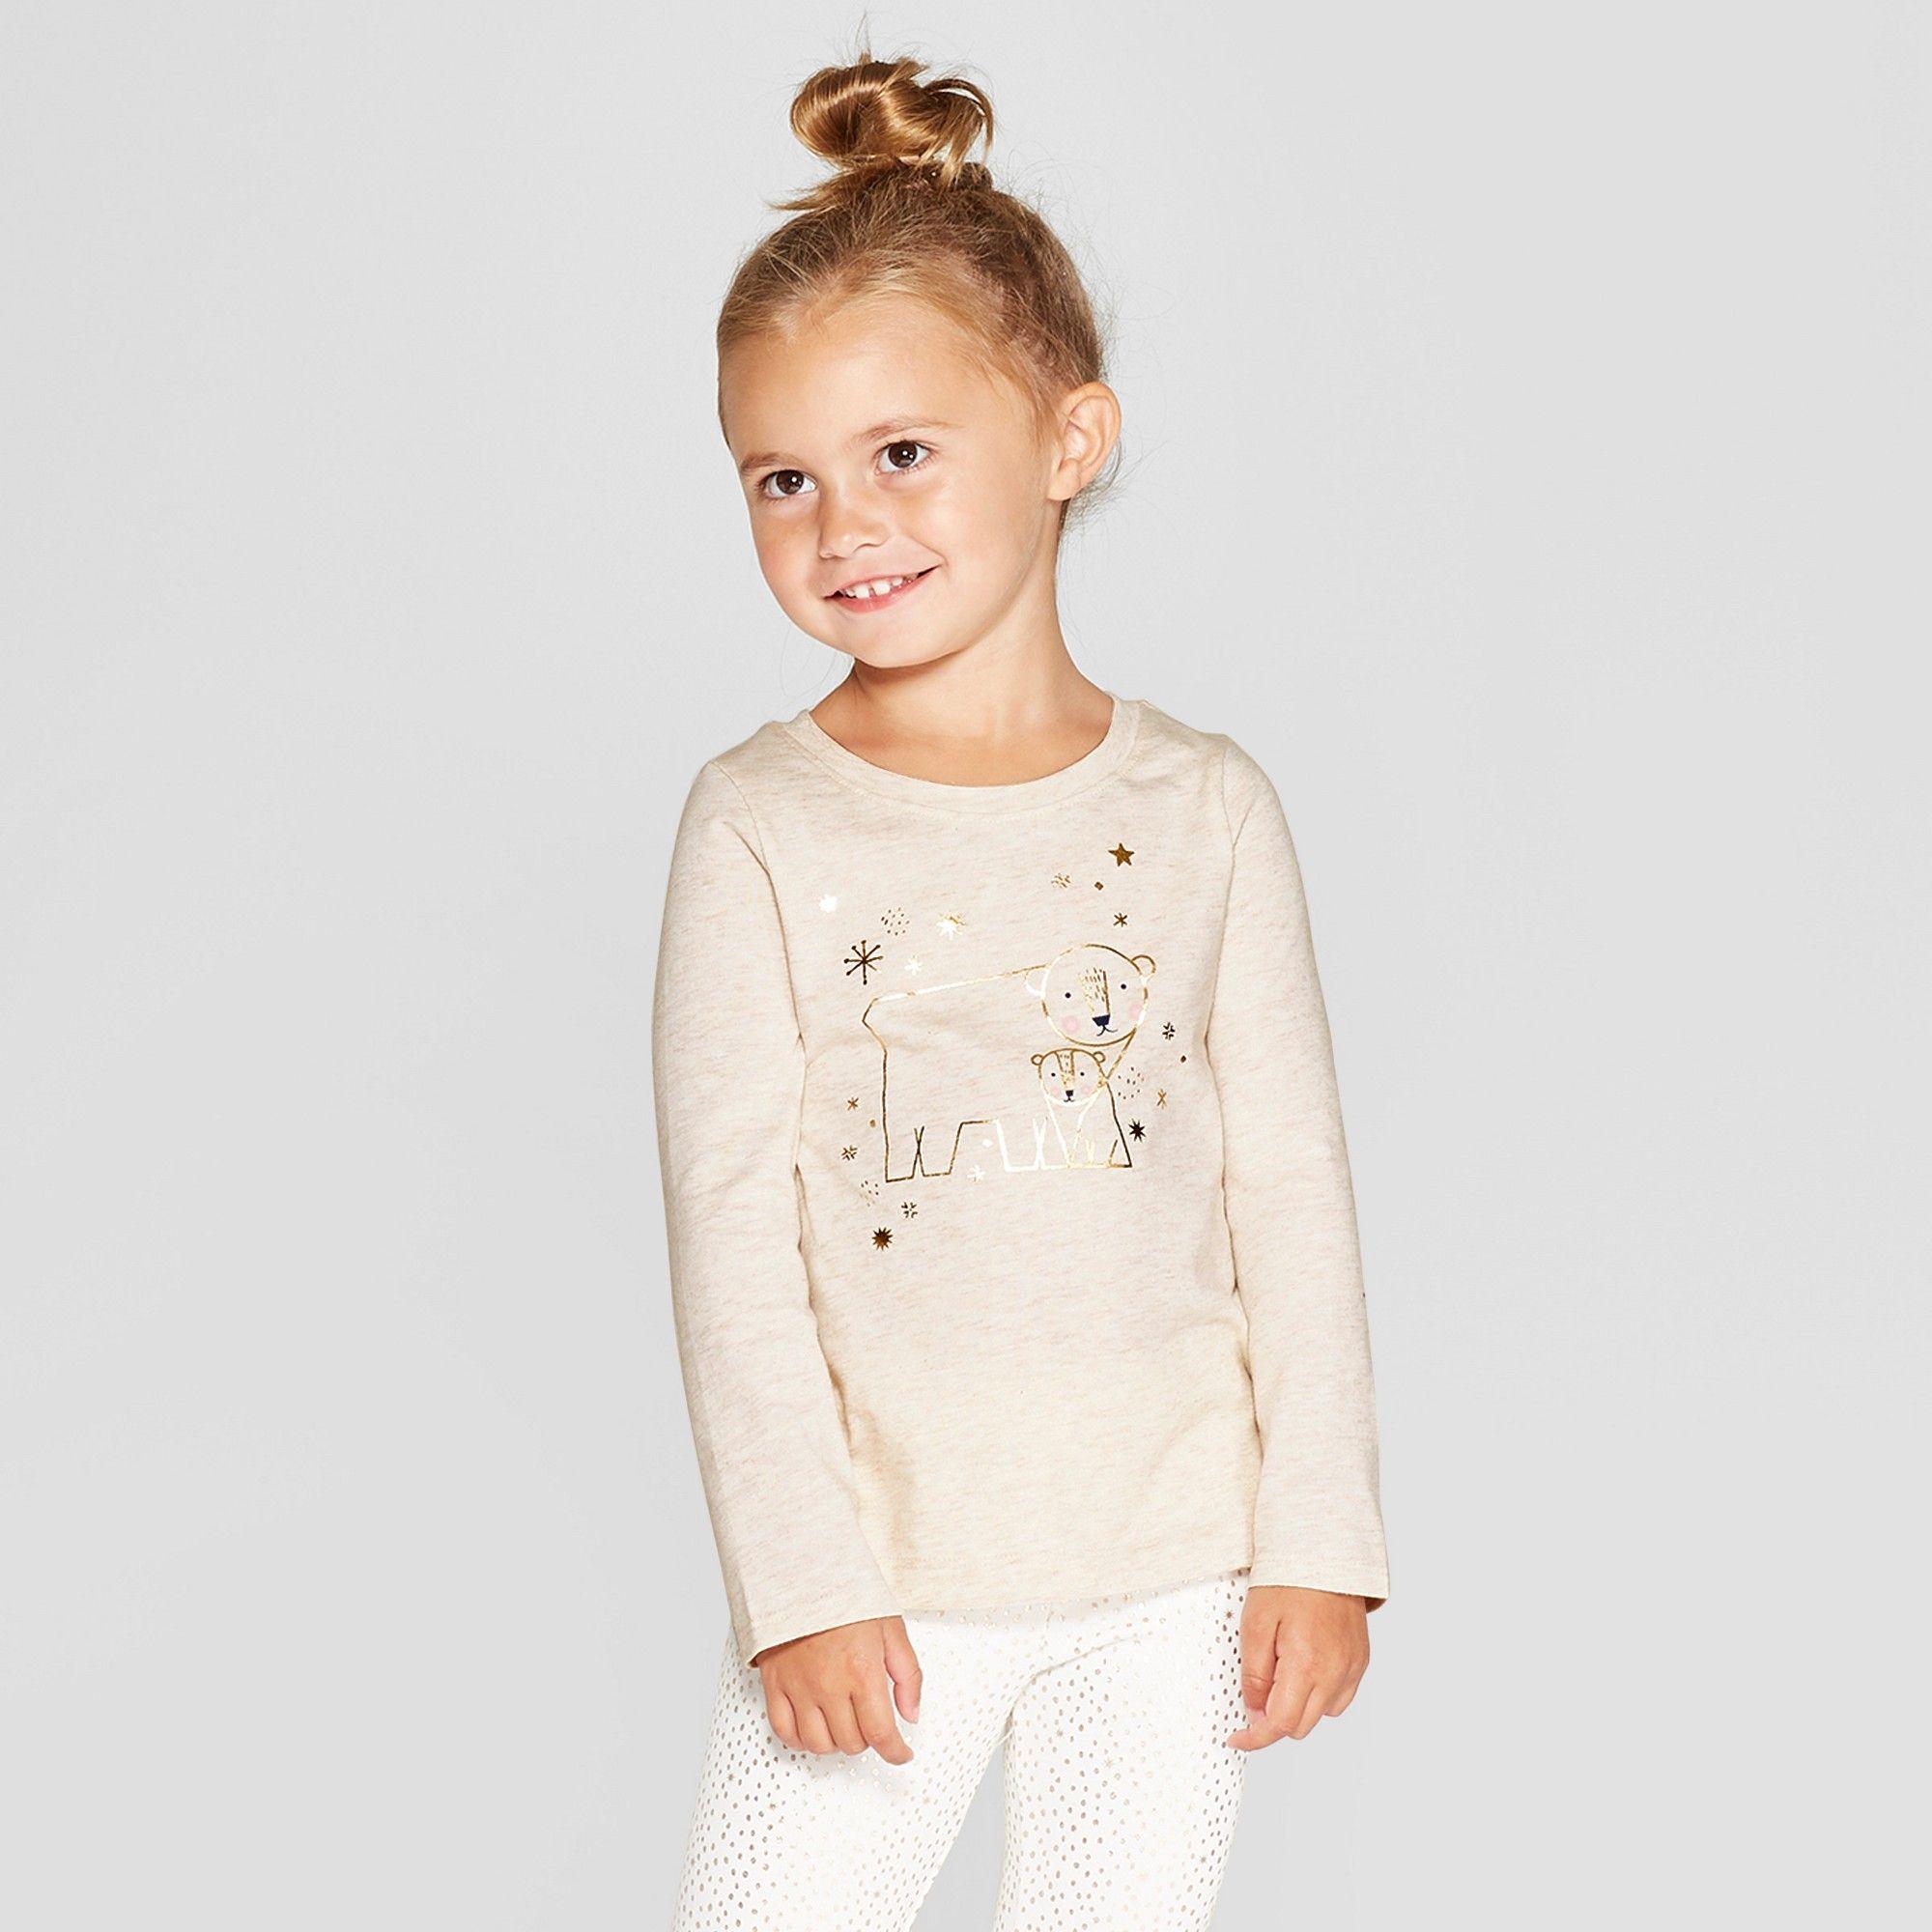 ab8425add Toddler Girls' Long Sleeve 'Polar Bear' Graphic T-Shirt - Cat & Jack  Oatmeal 12M, Brown